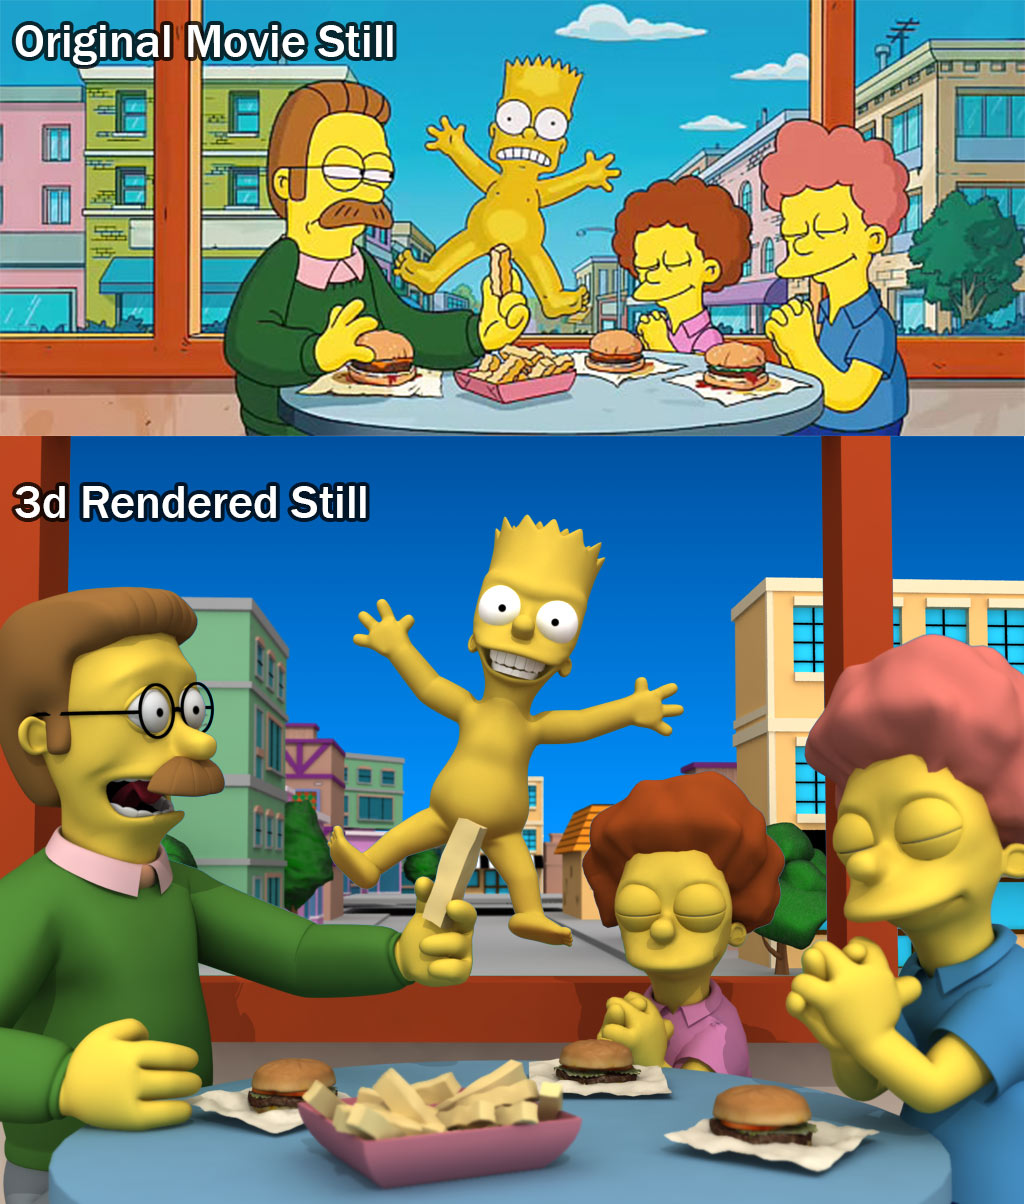 Simpson_NakedBart_Flying3d